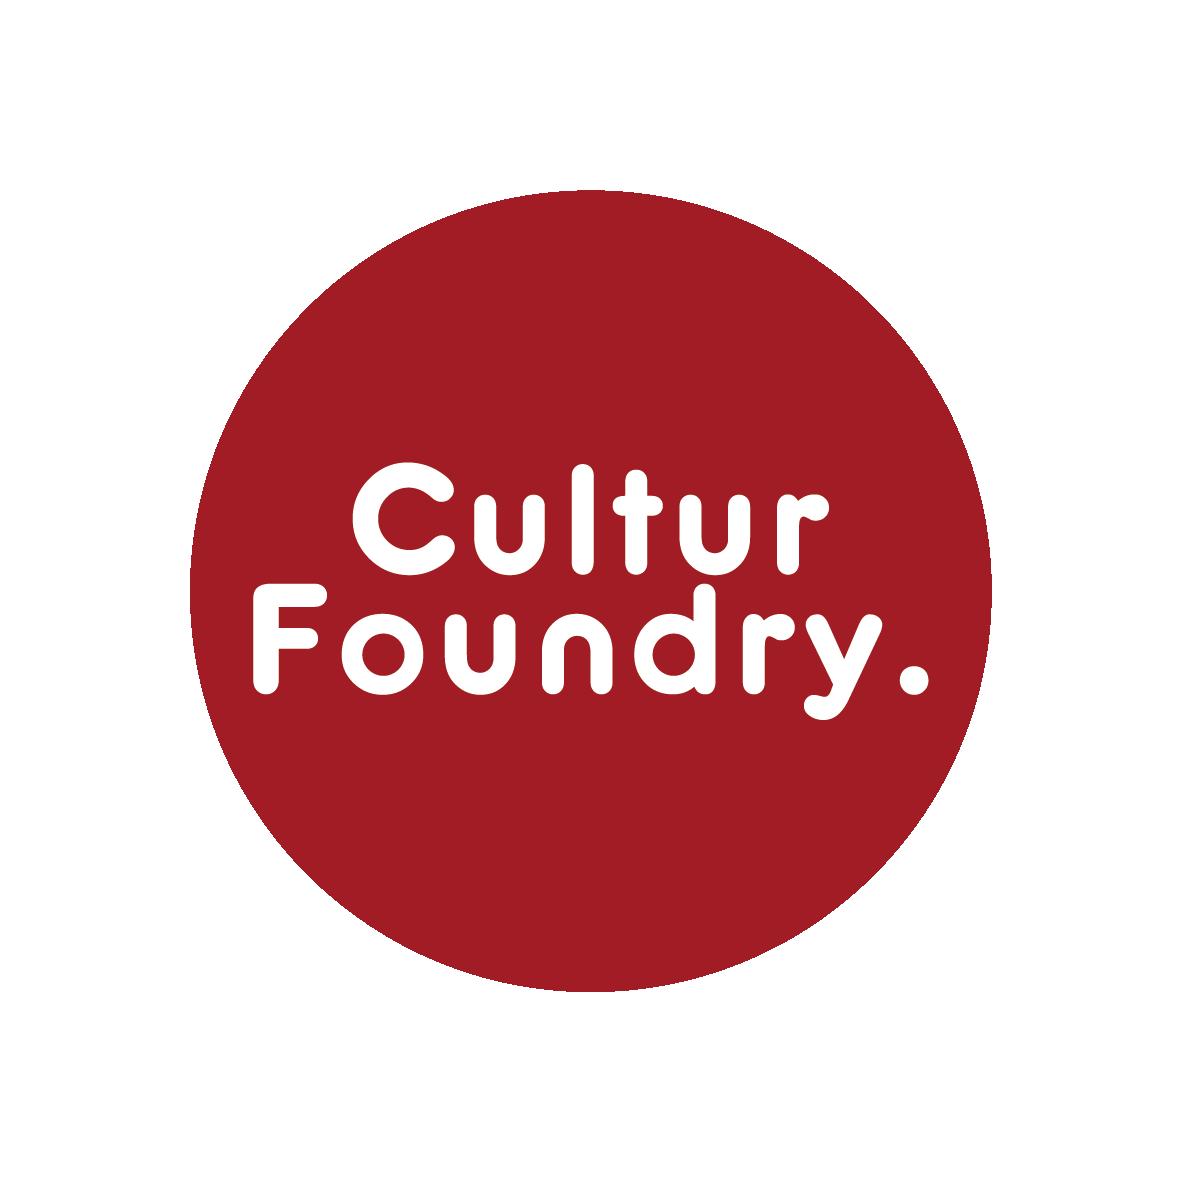 CulturFoundry